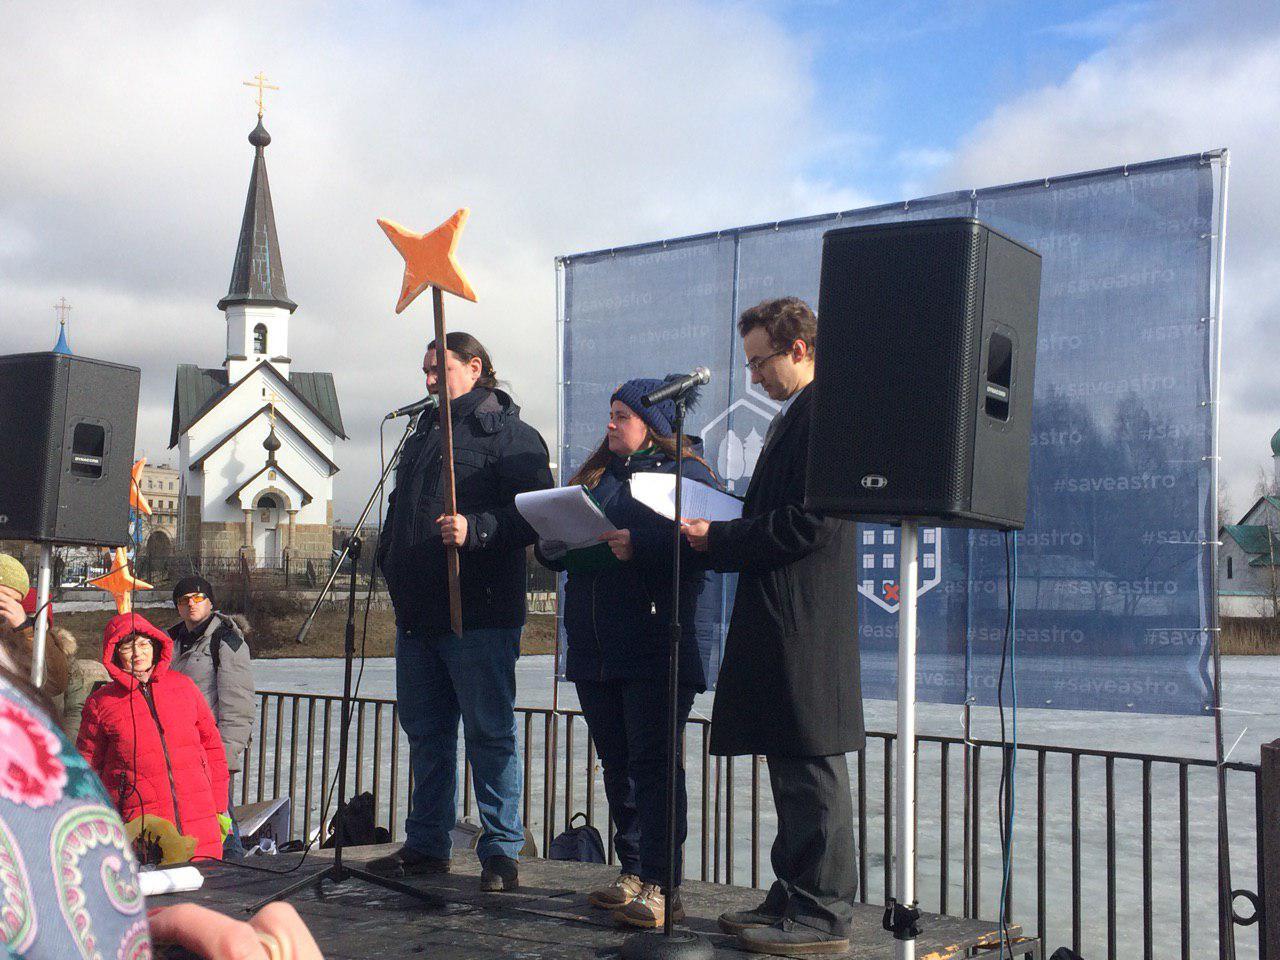 фото ЗакС политика Митинг в защиту Пулковской обсерватории завершился принятием резолюции